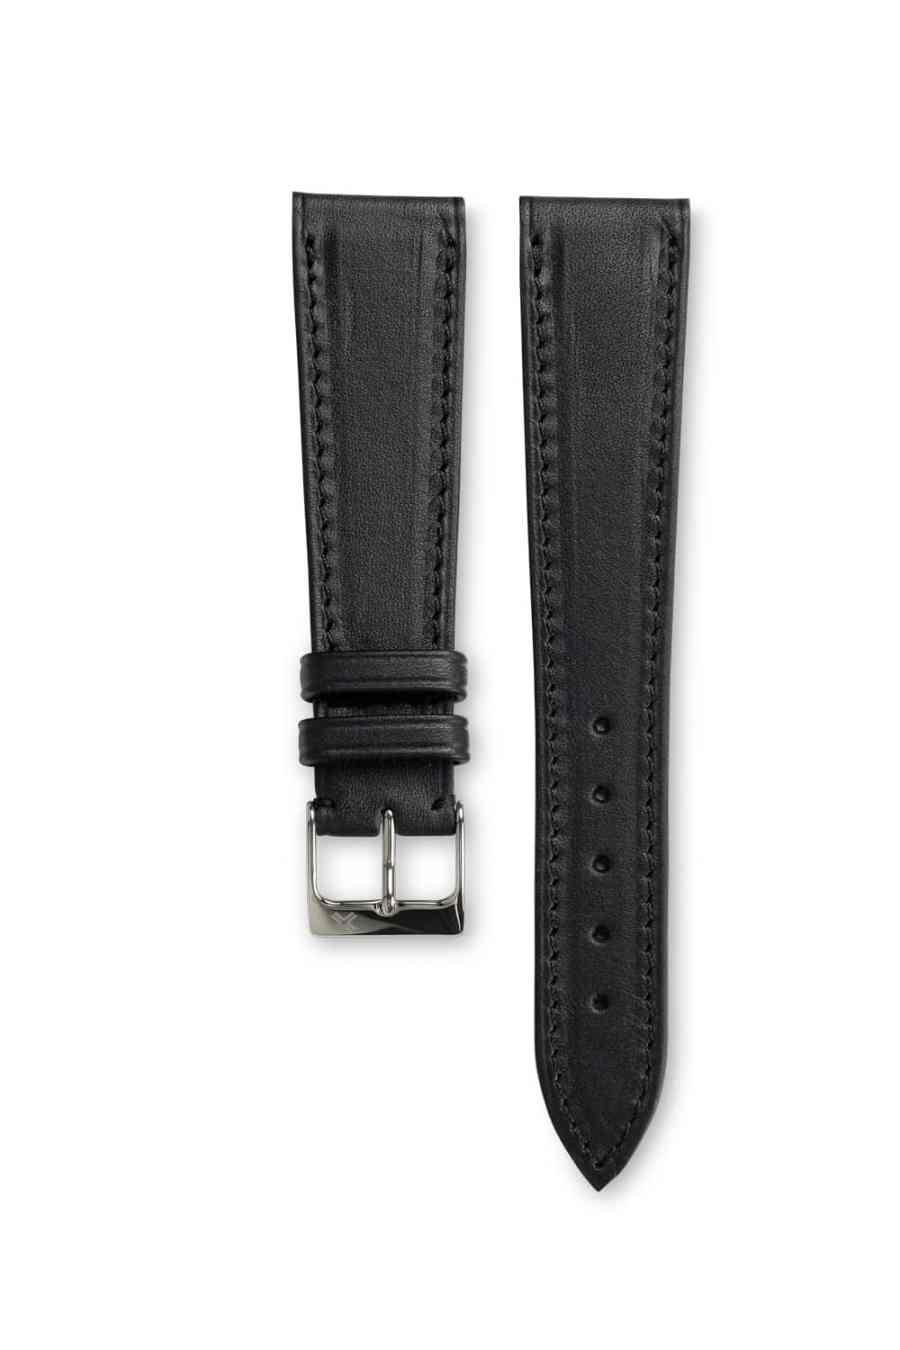 Smooth Barenia Classic deep black leather watch strap - tone on tone stitching - LUGS brand